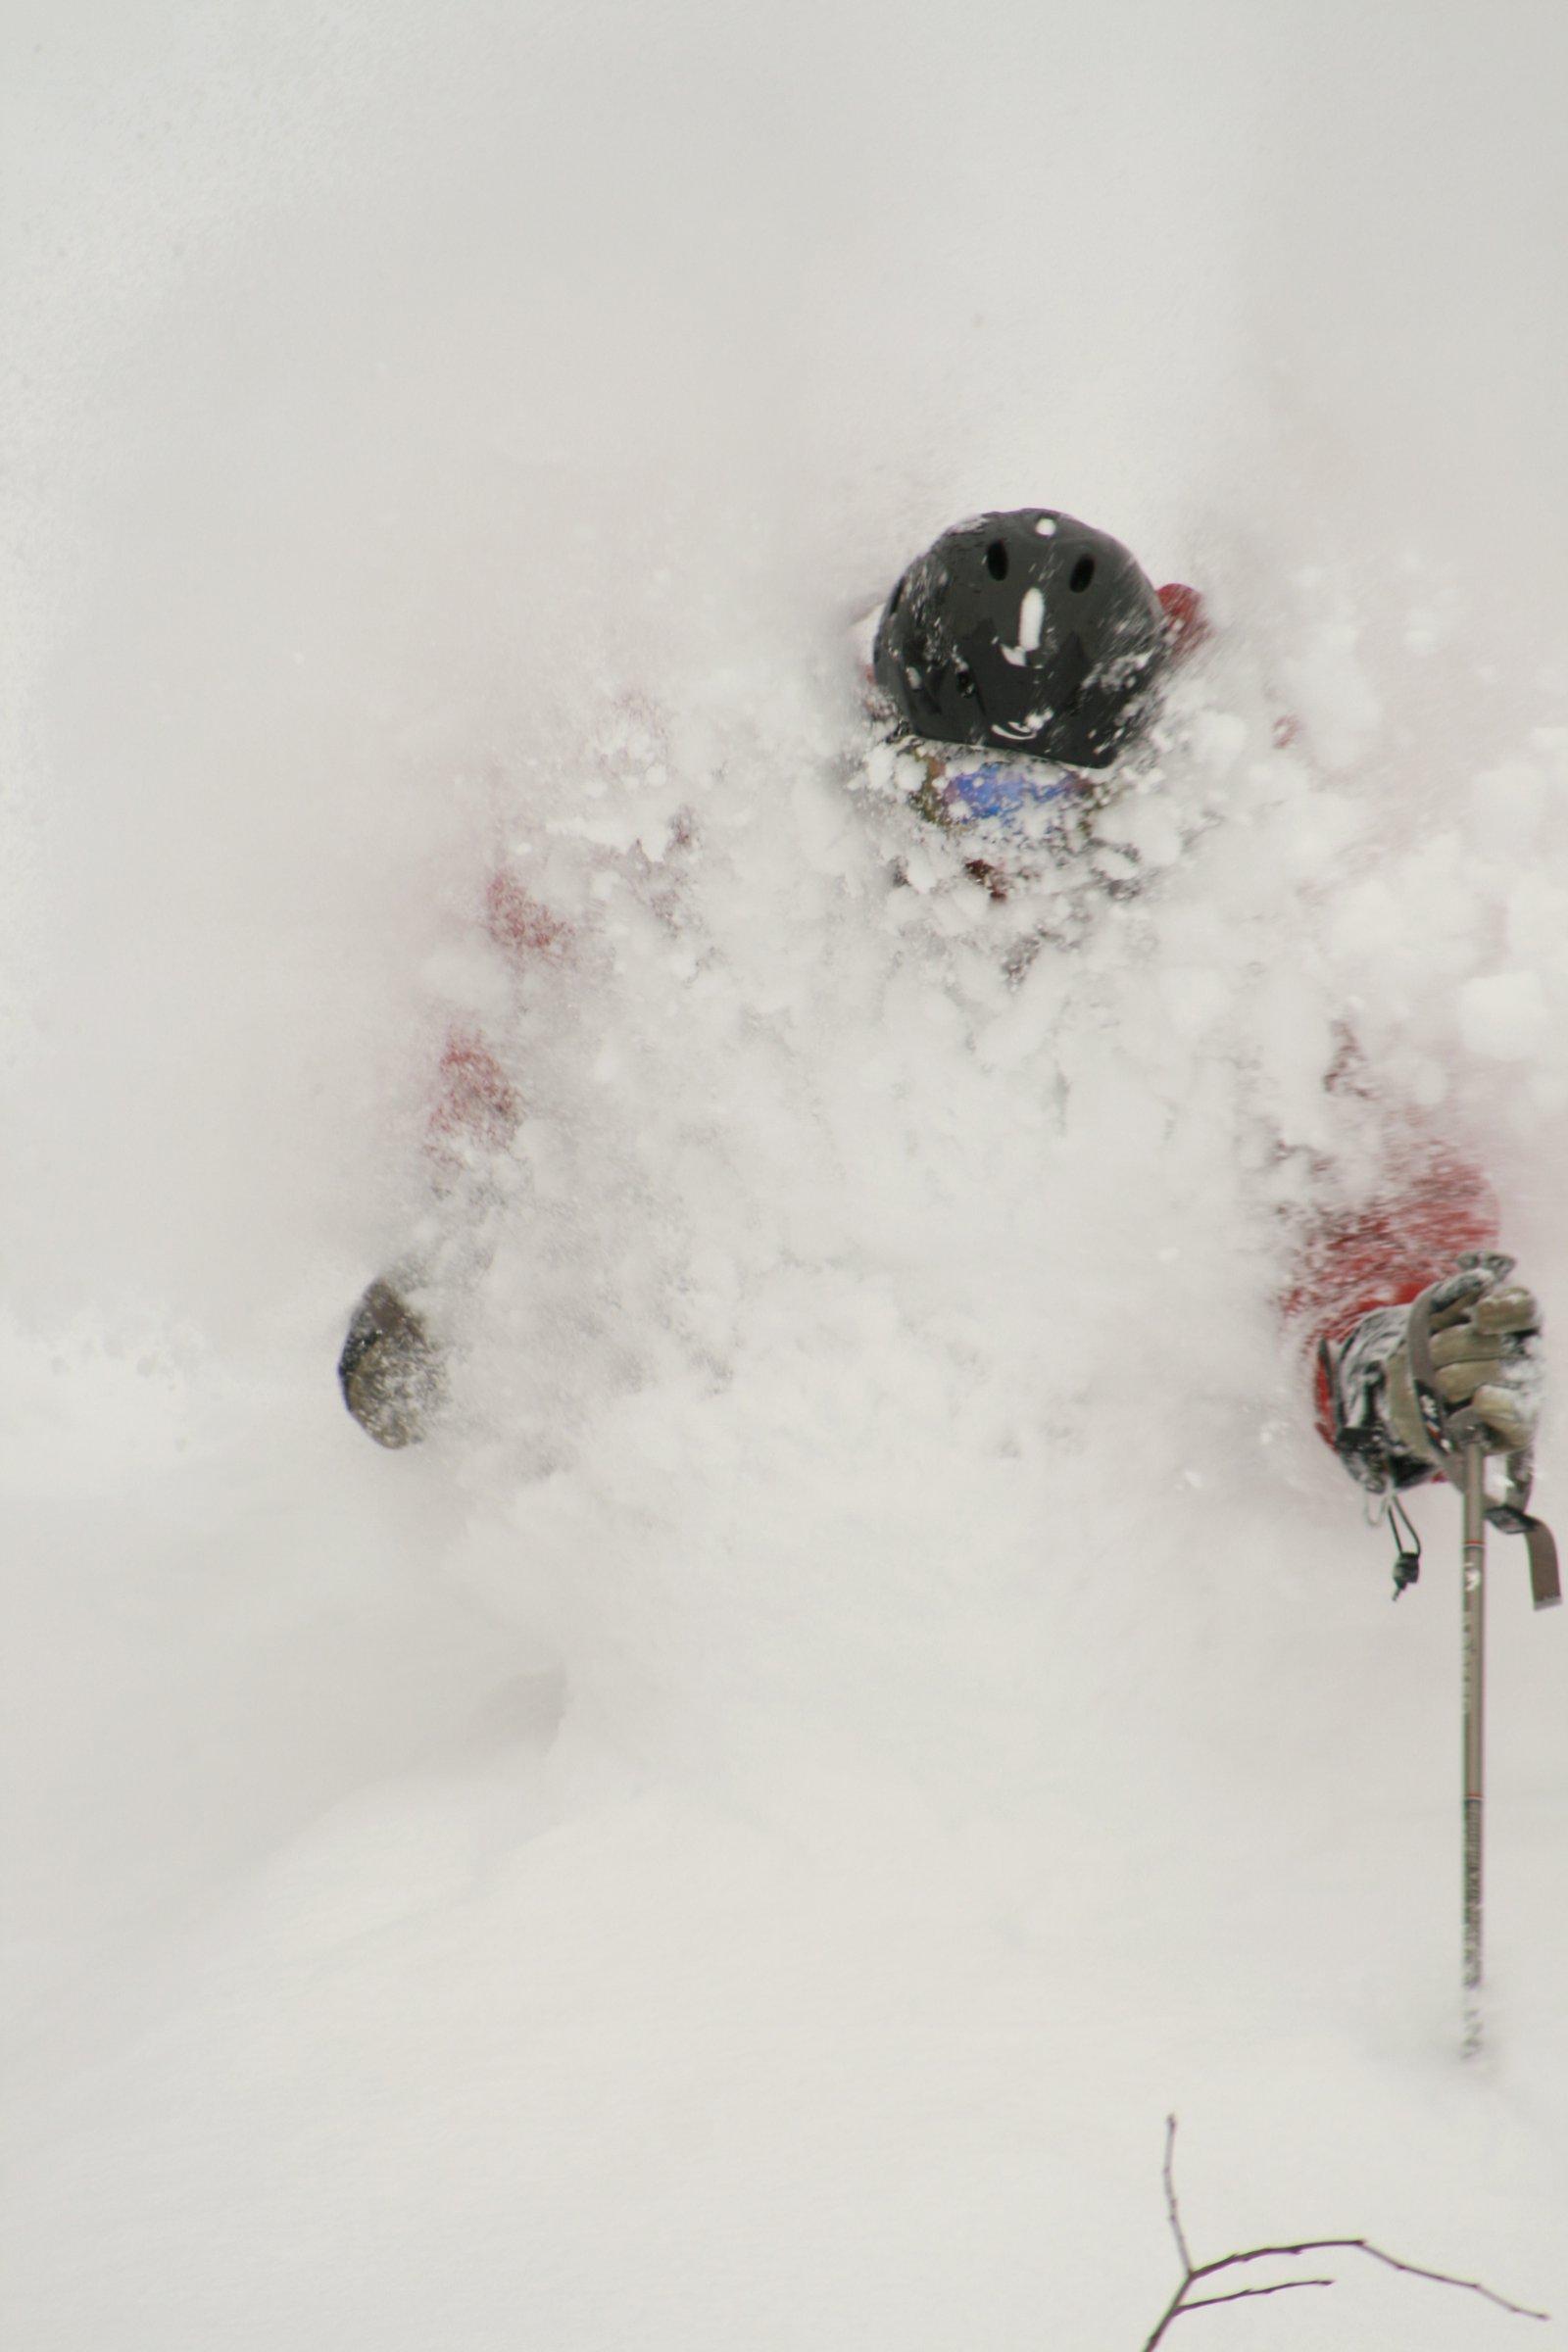 Face Shots at Jackson Hole